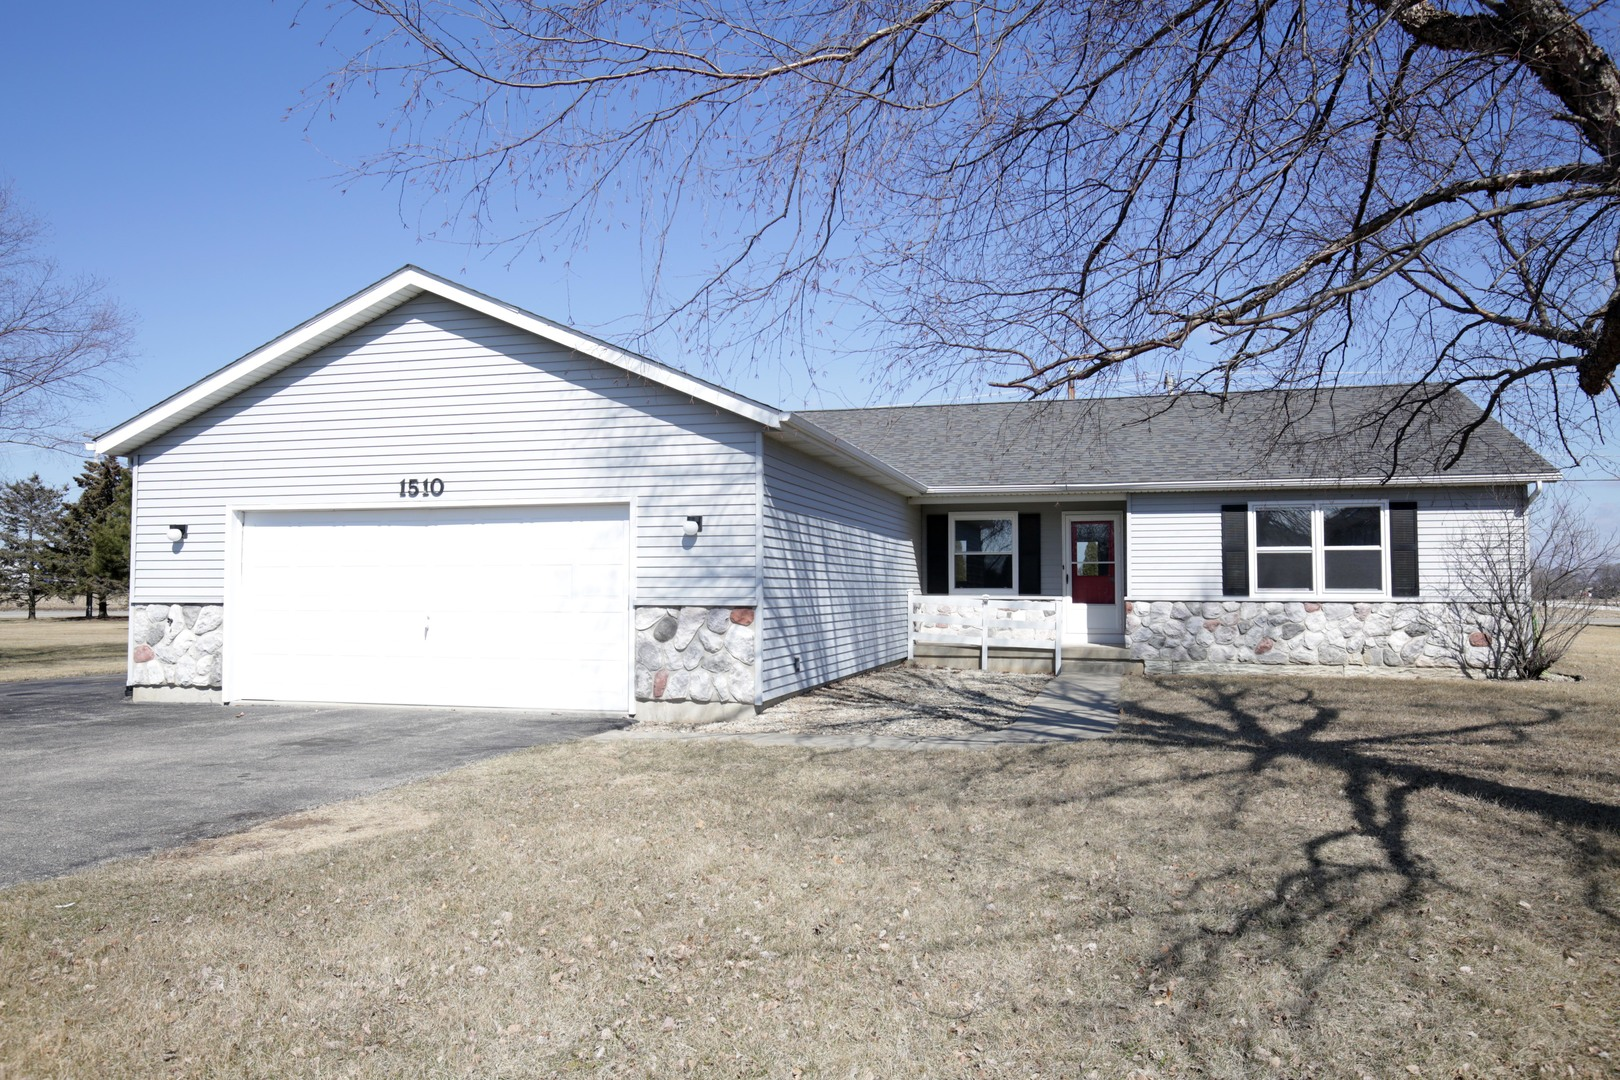 Property for sale at 1510 Cobblestone Court, Johnsburg,  IL 60051